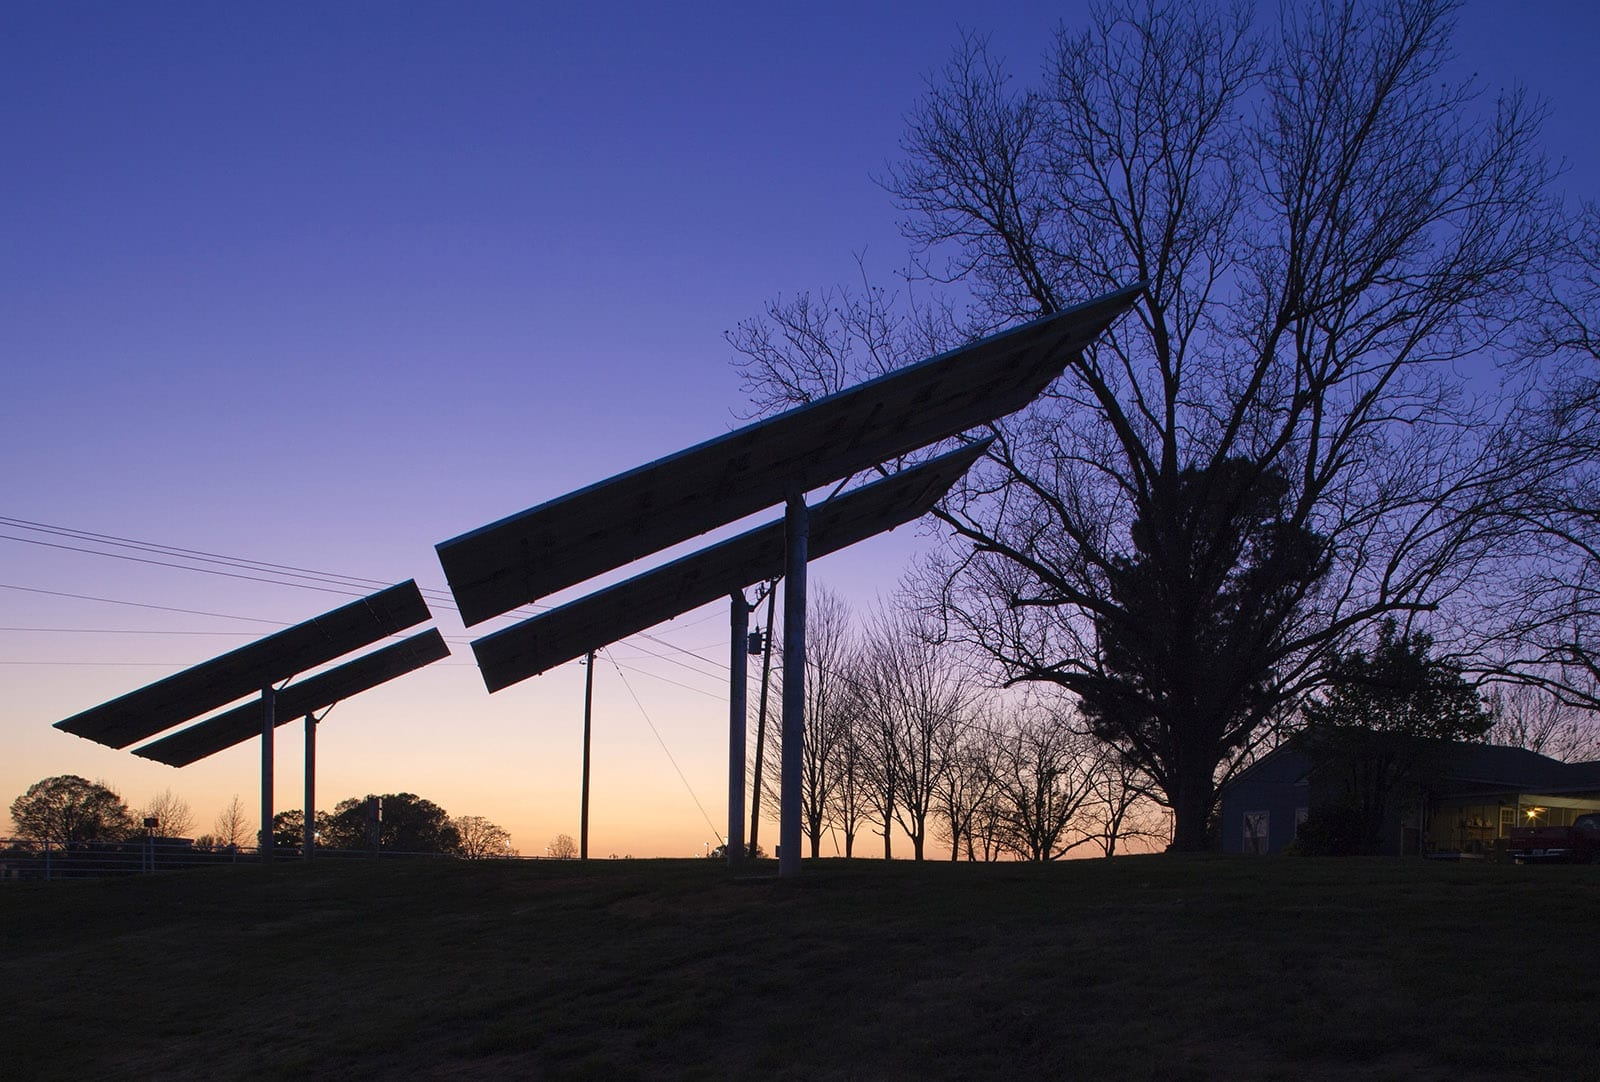 Night Shot of Solar Panels at NTCC